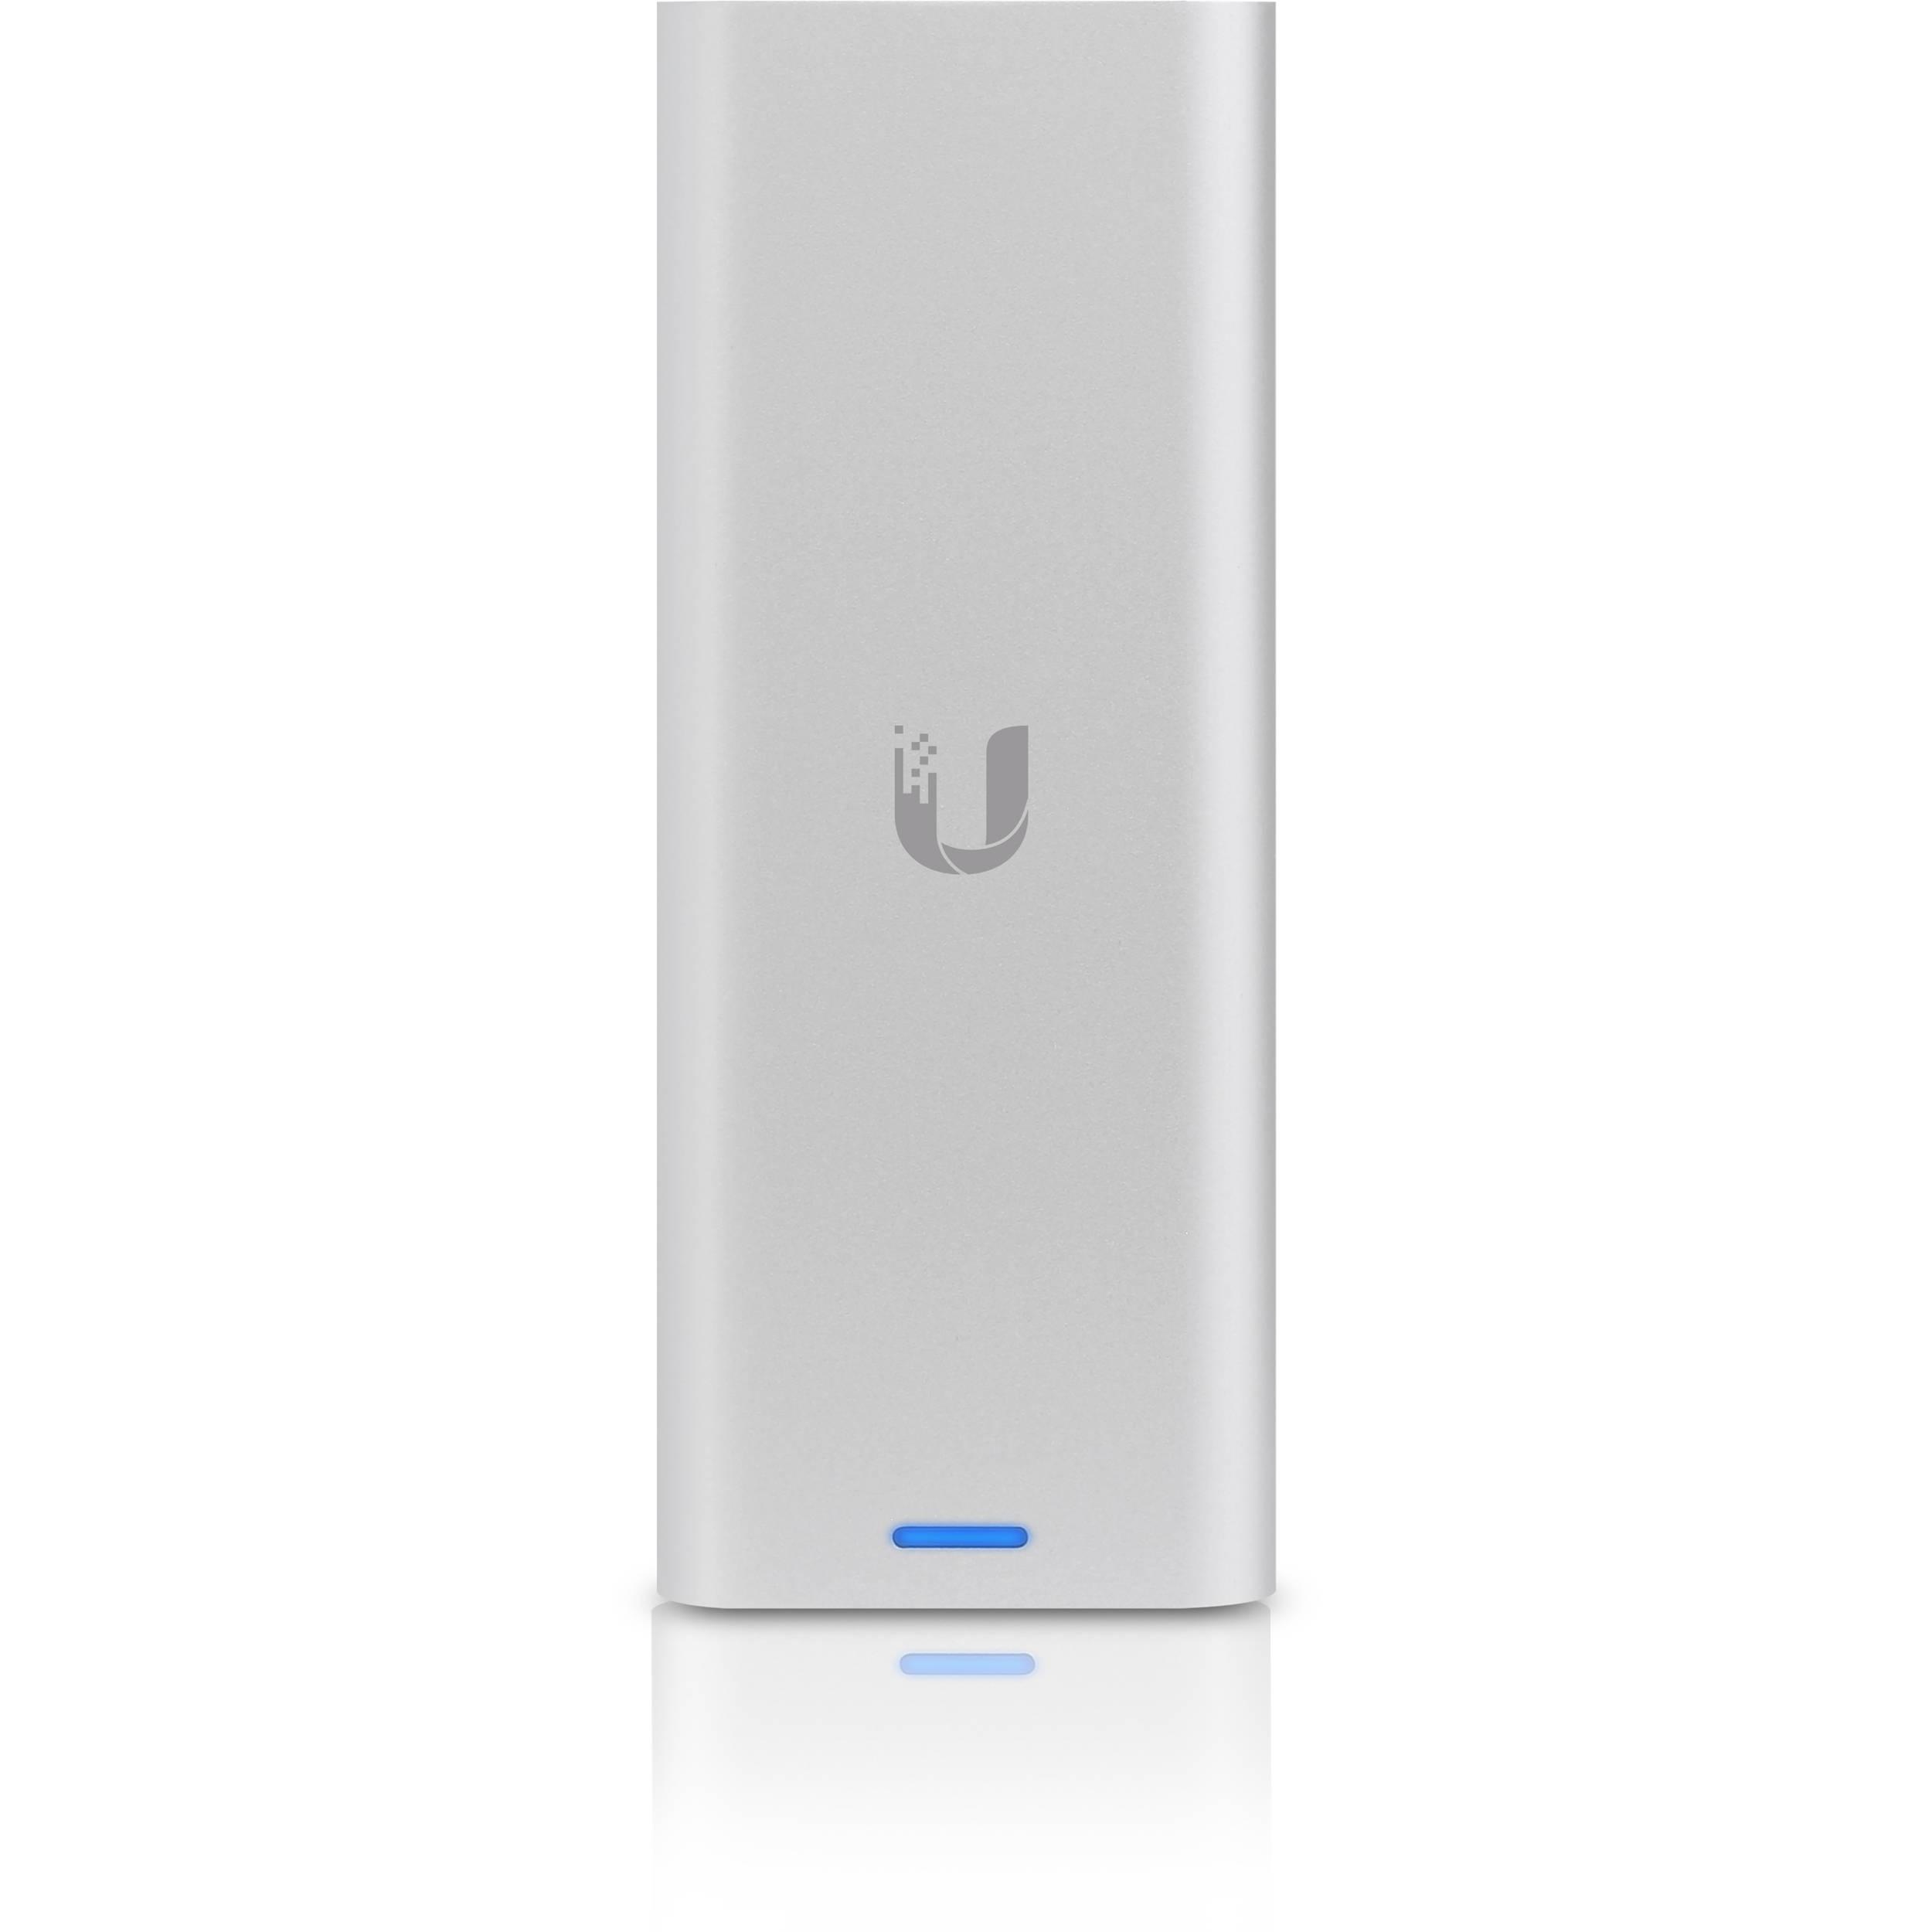 Ubiquiti Networks UniFi Cloud Key Gen2